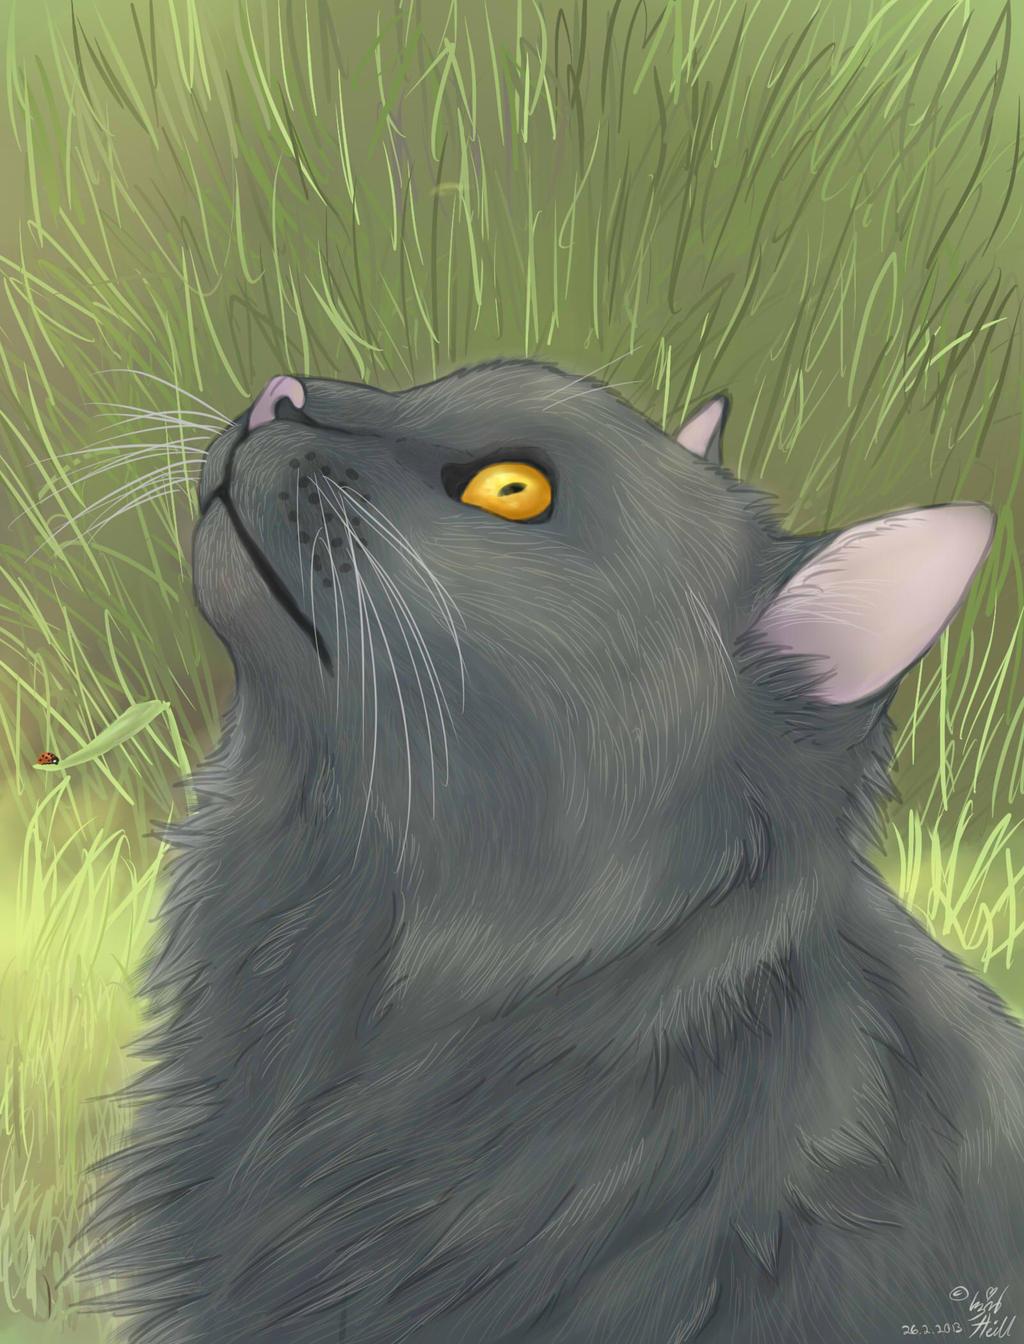 Outside Cat Long-hair By Kyuubi-Doodler On DeviantArt